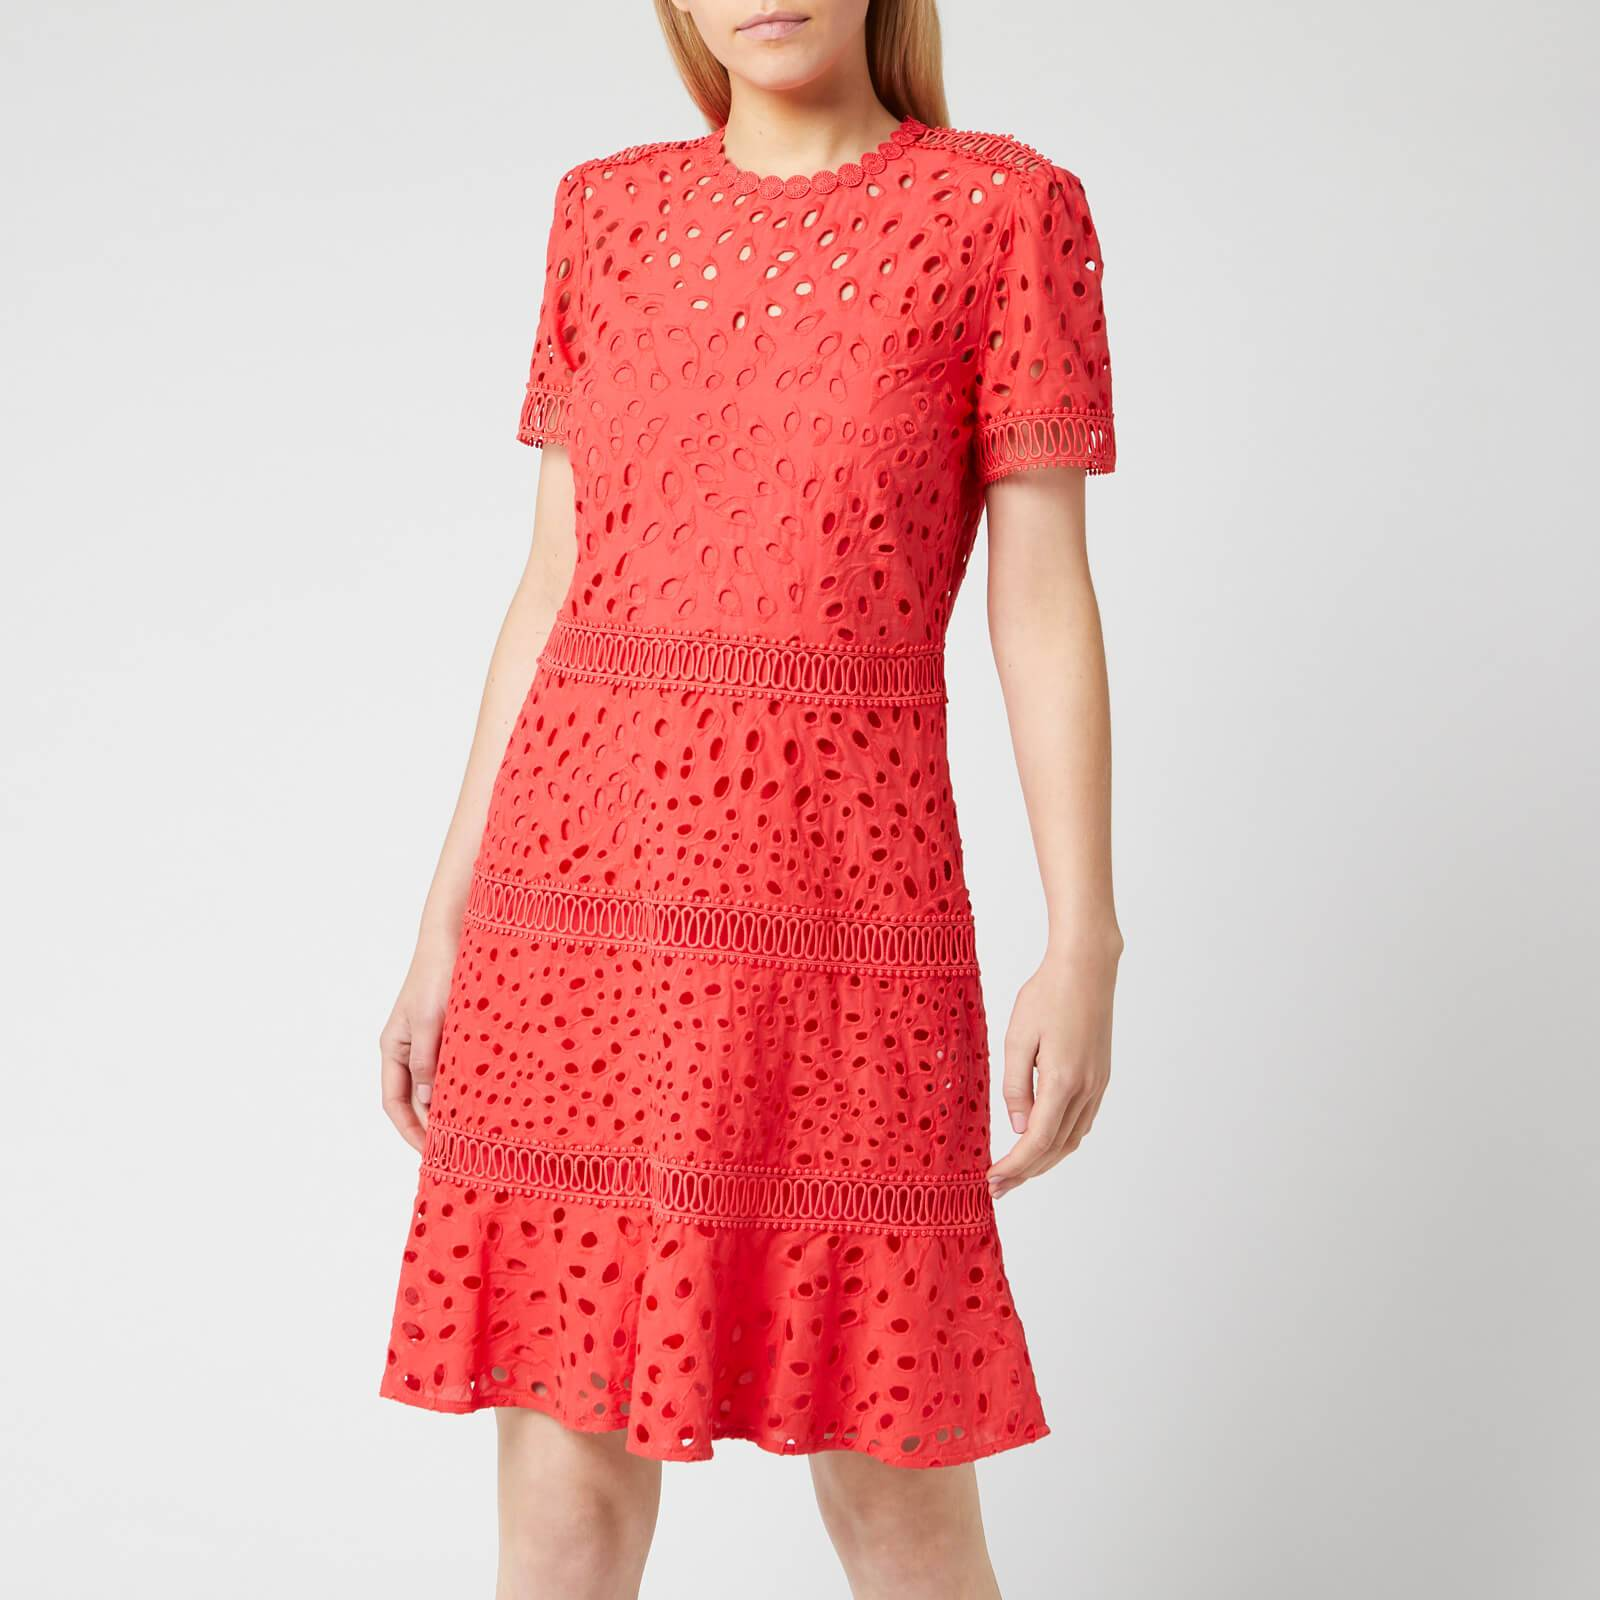 MICHAEL MICHAEL KORS Women's Eyelet Mix Dress - Sea Coral - US 6/UK 10 - Blue